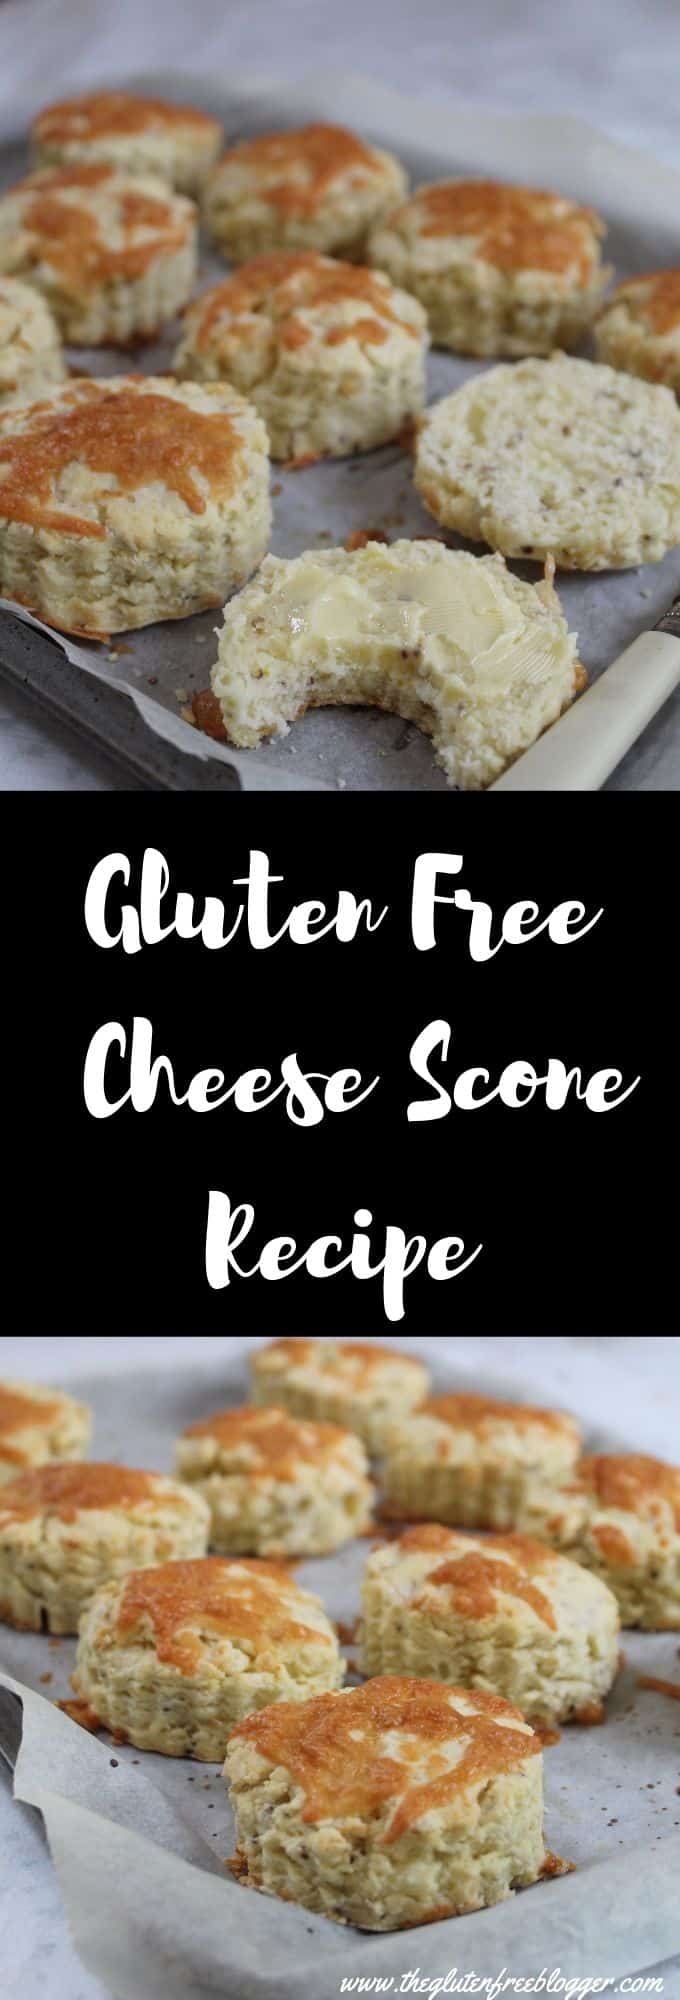 Copy of gluten free cheese scones recipe - cheese scone recipe - gluten free savoury cream tea - coeliac celiac - easy baking recipe